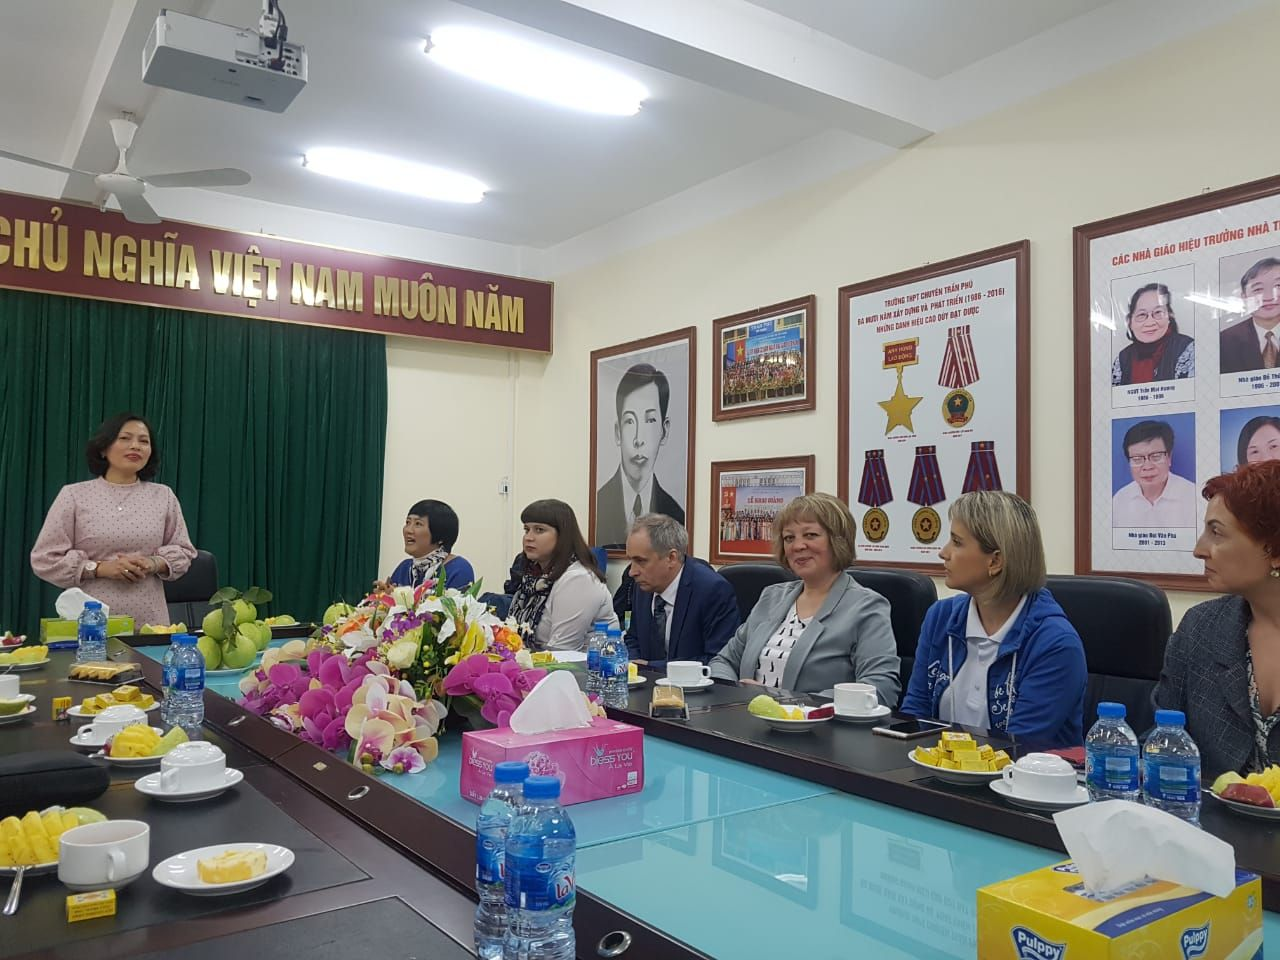 Презентация ВГУЭС и Олимпиада по русскому языку и во Вьетнаме